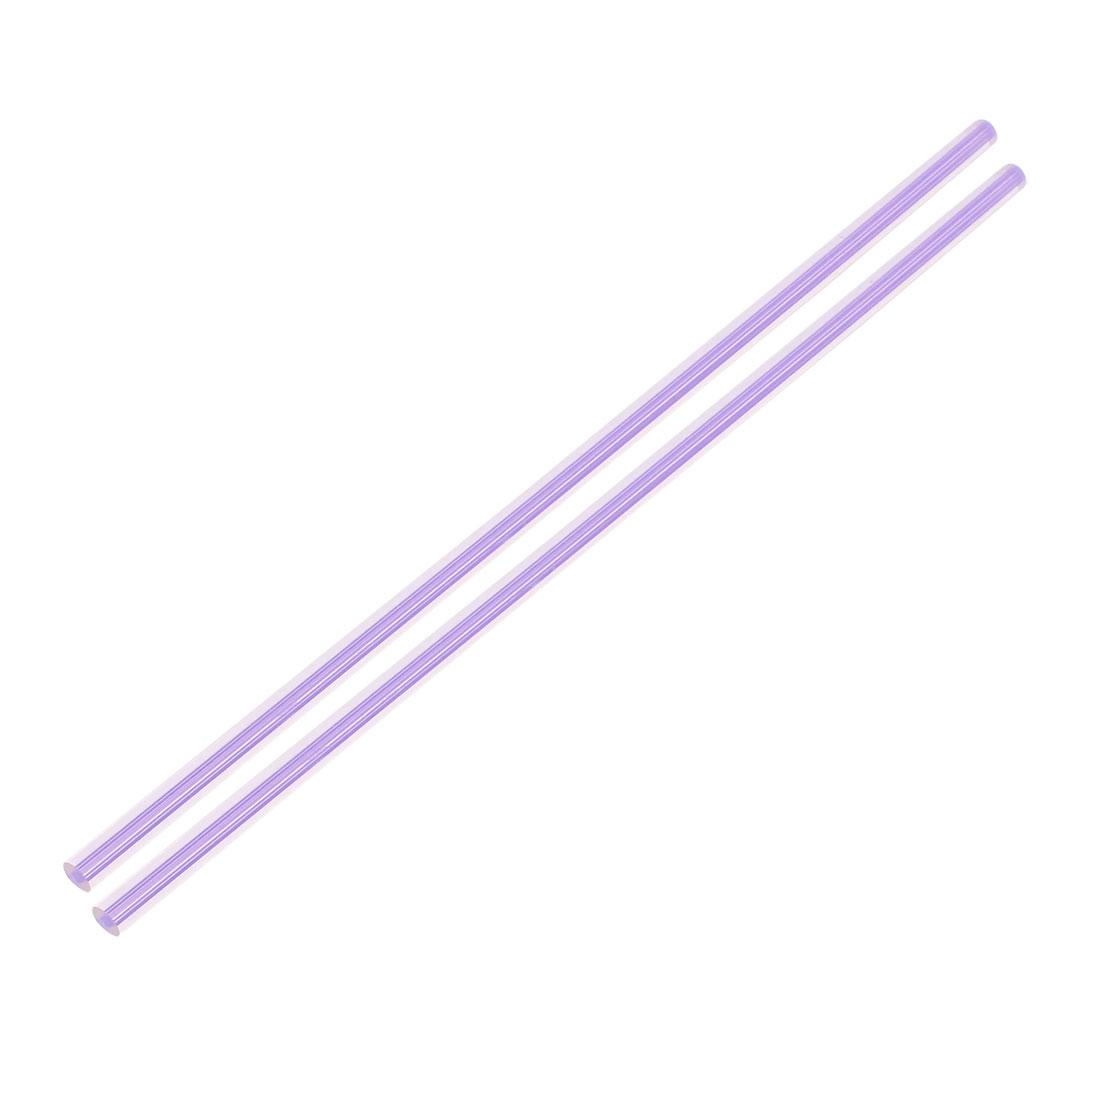 6mmx250mm Straight Light Purple Line Solid Acrylic Round Rods PMMA Bars 2pcs